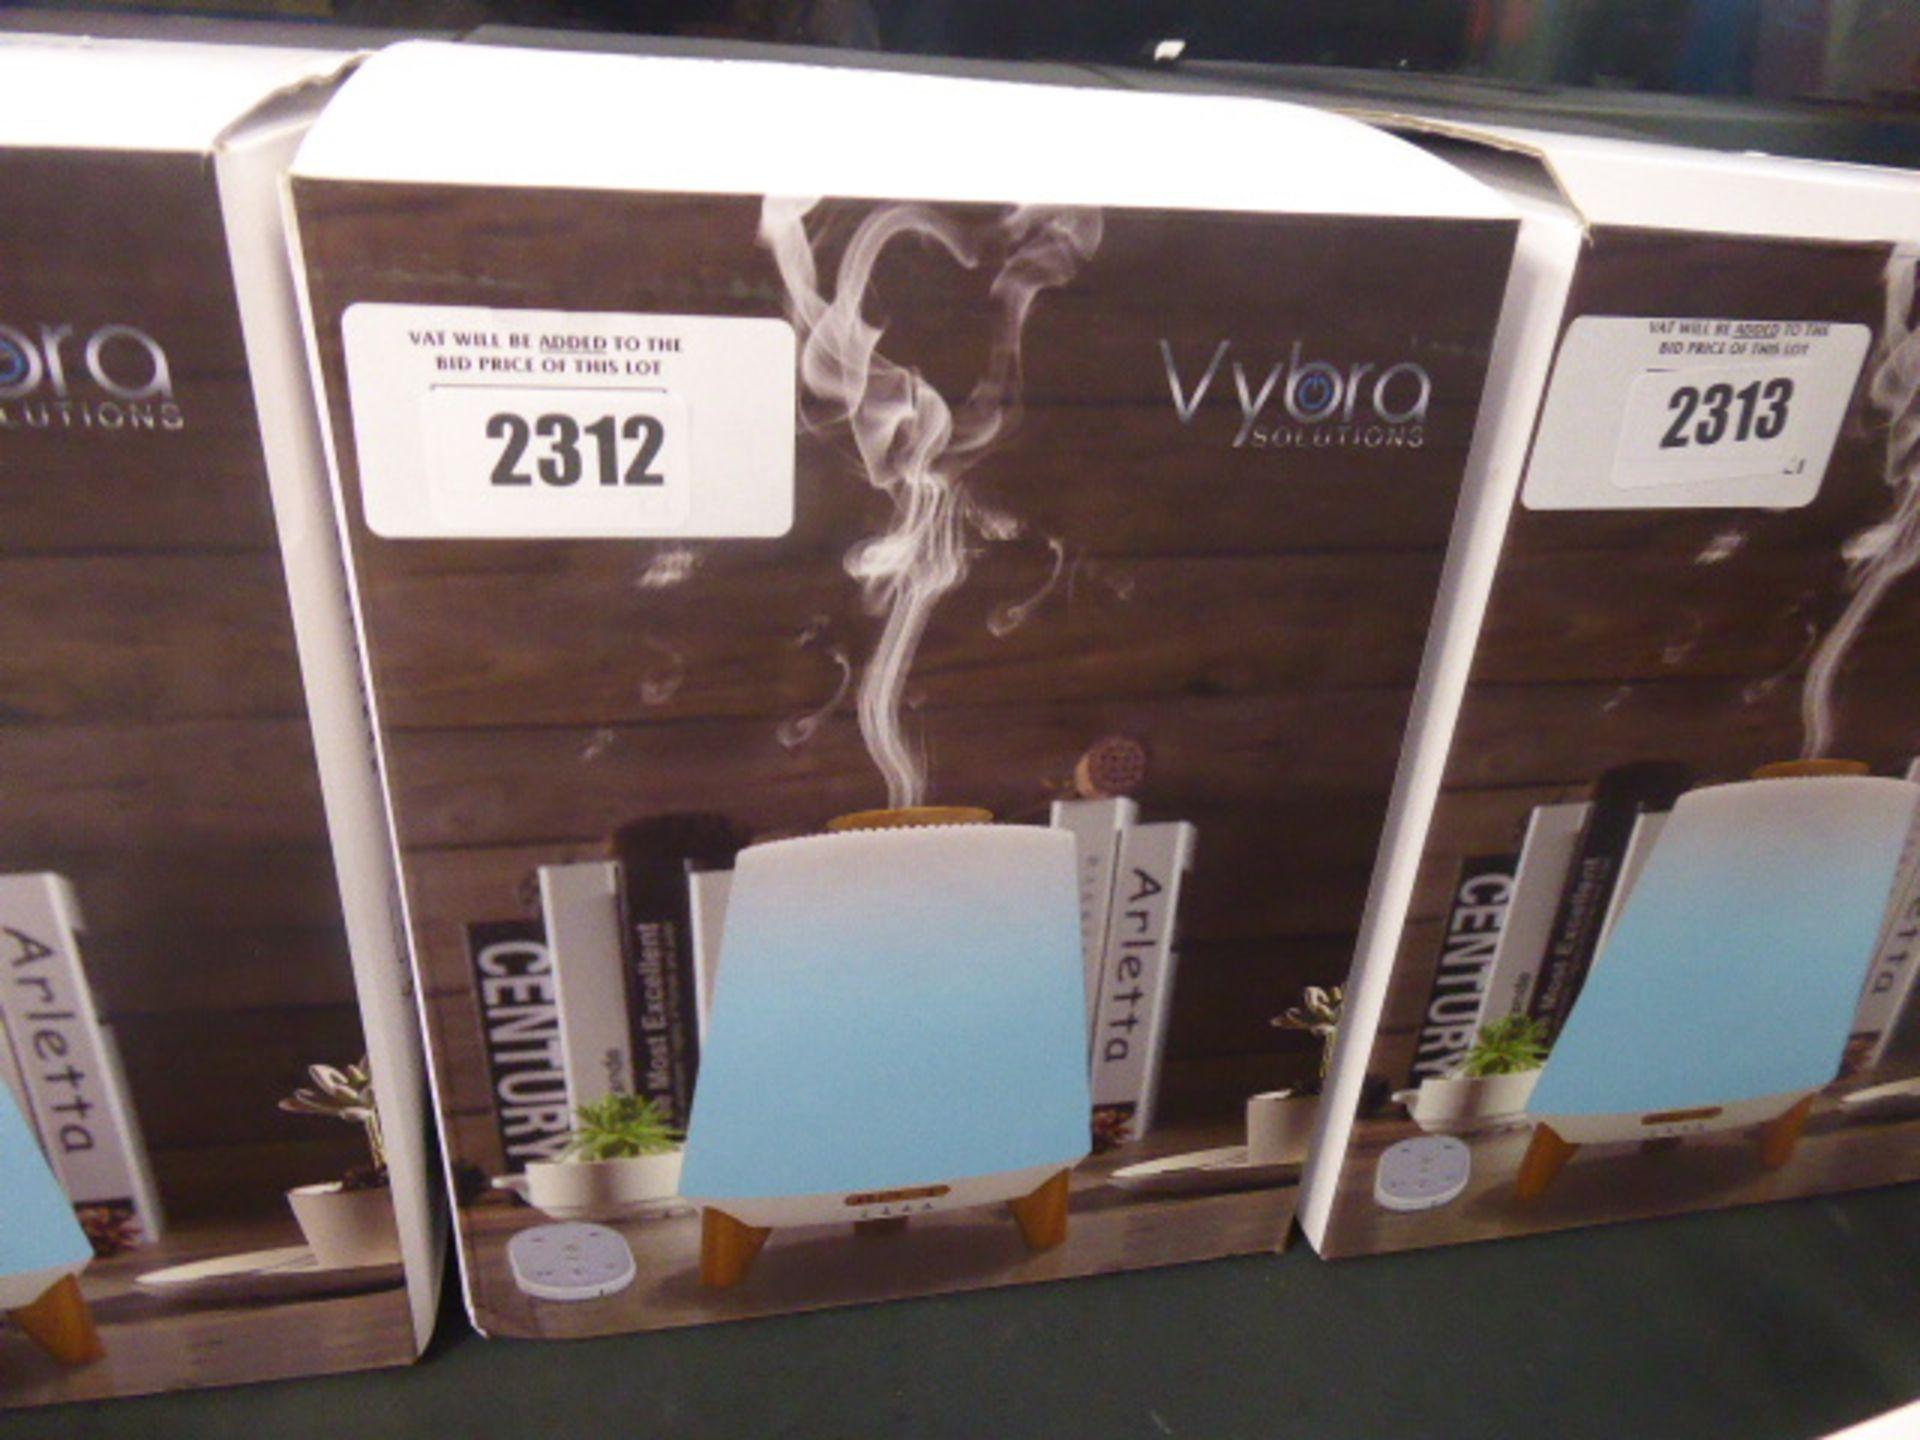 Lot 2312 - VYBRA Solutions atmos speaker in box